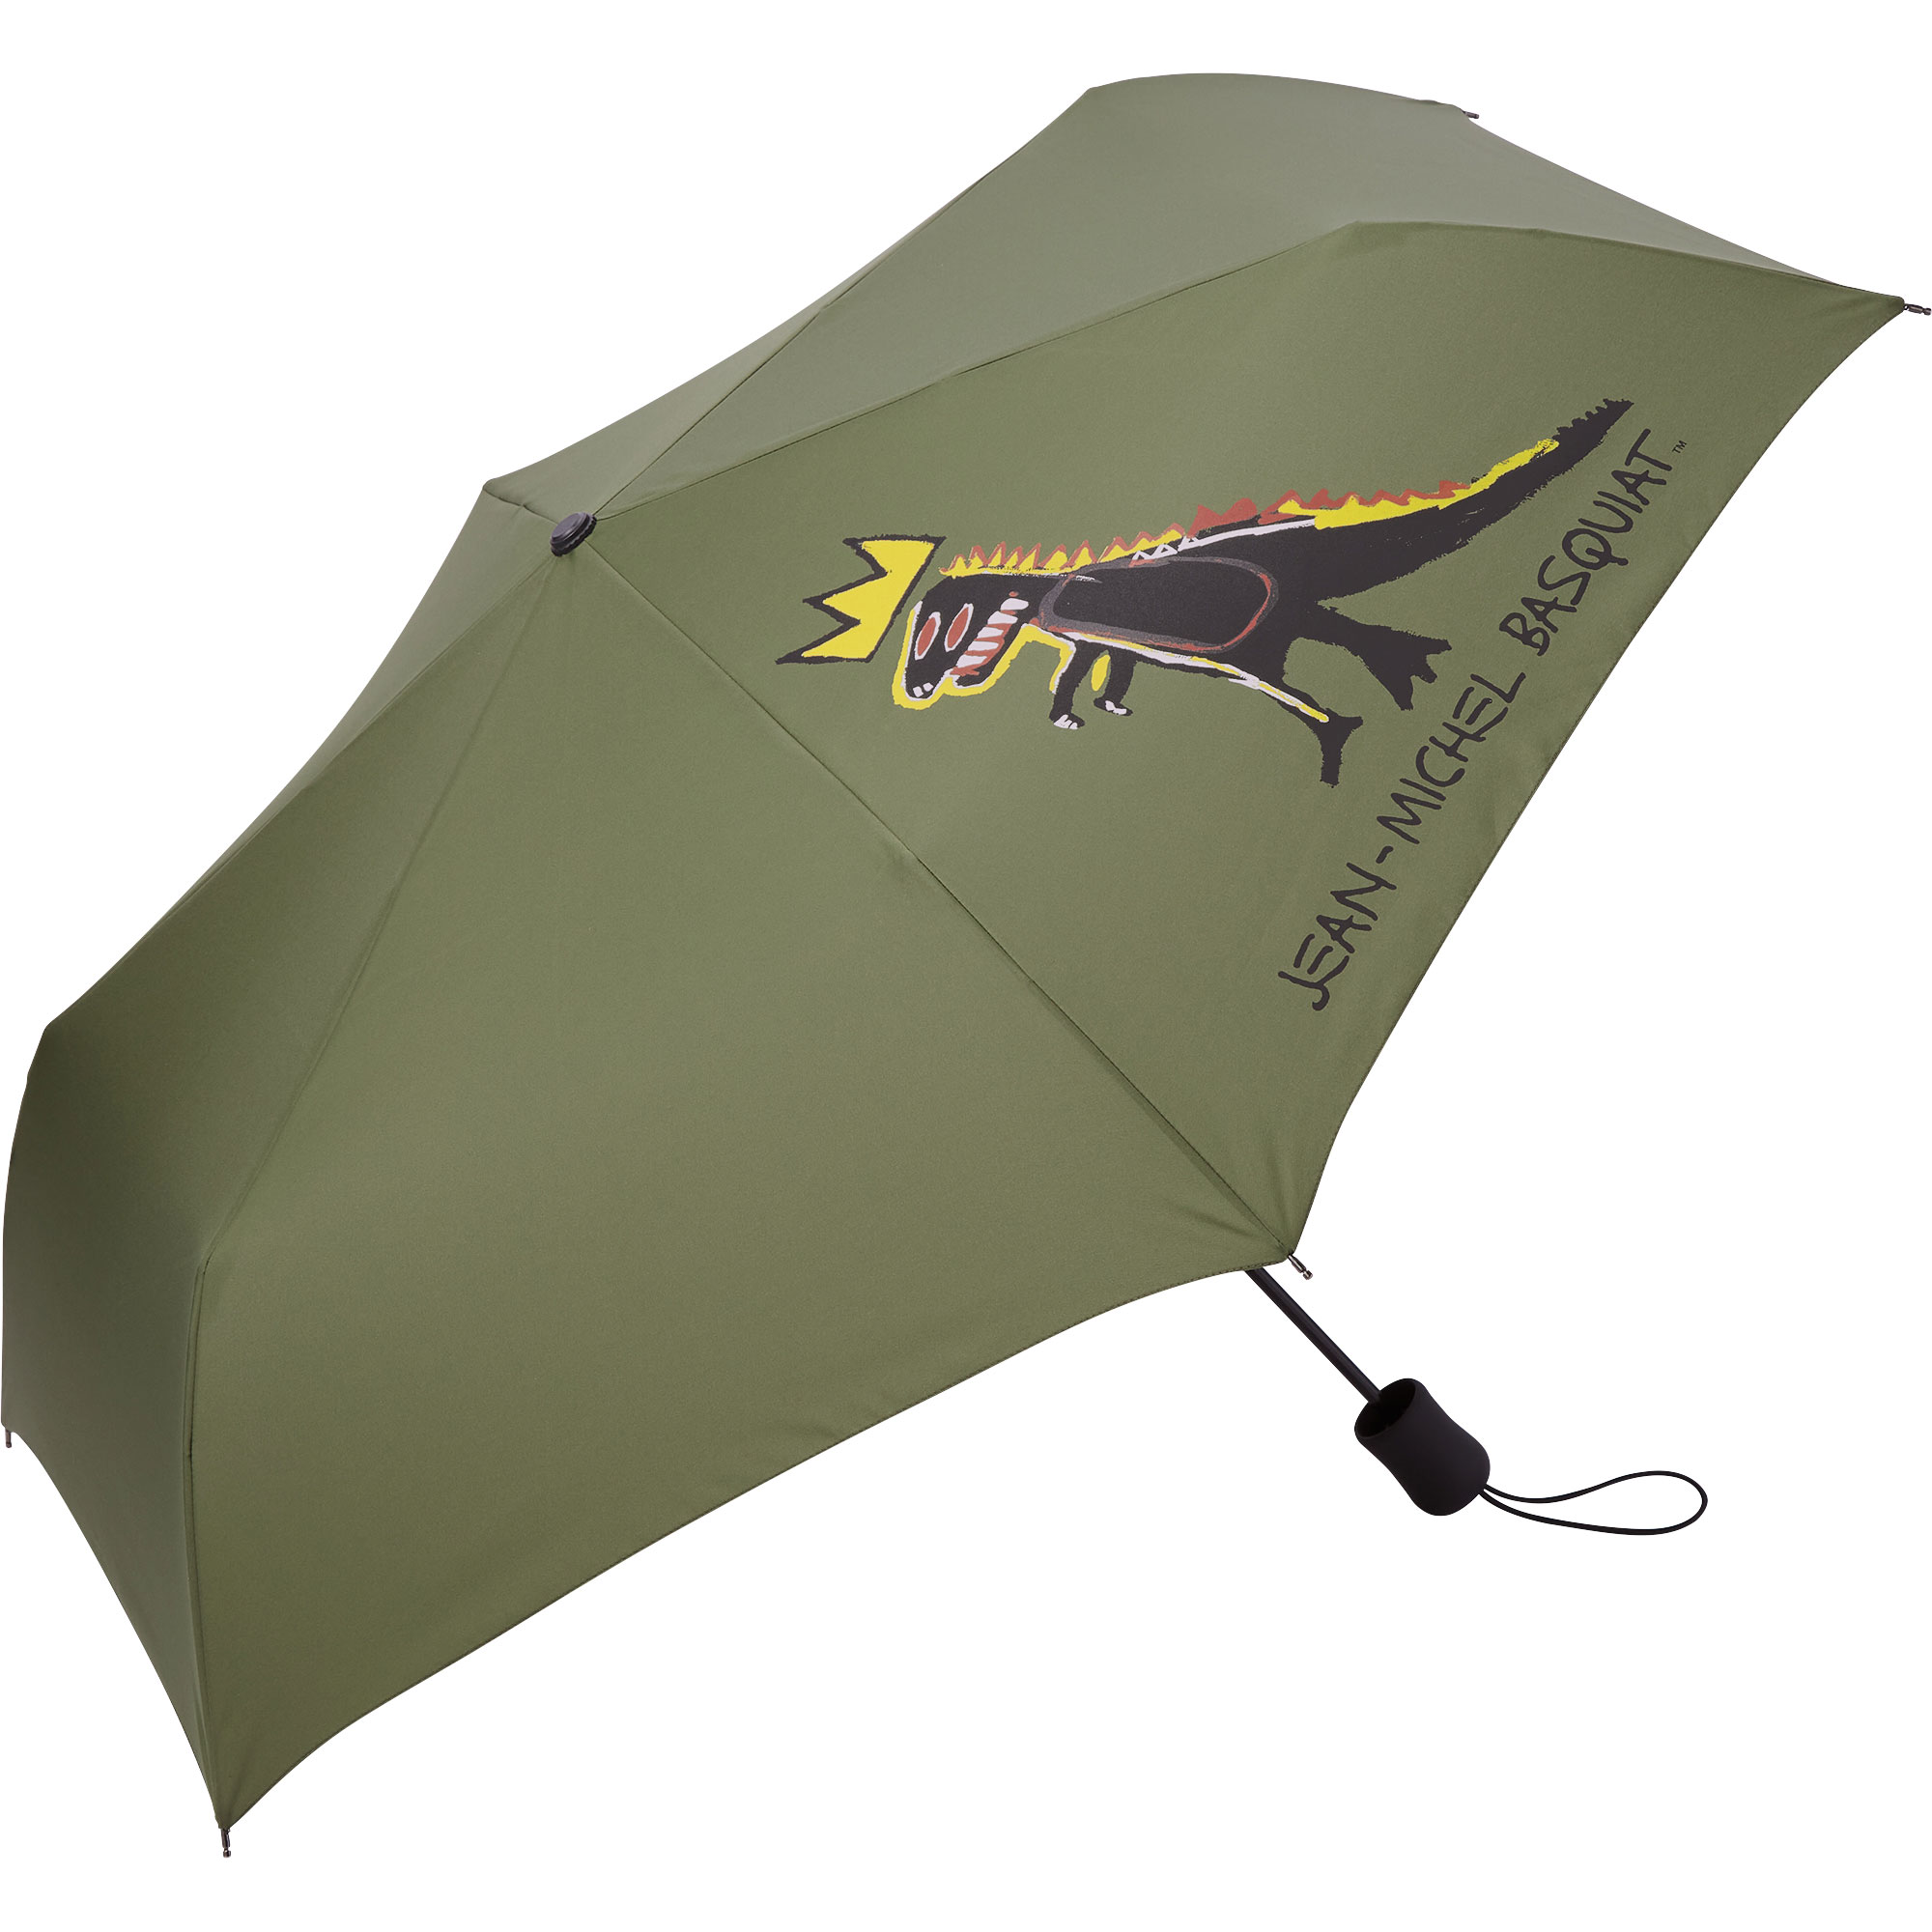 Jean-Michel Basquiat UV Protection Compact Umbrella